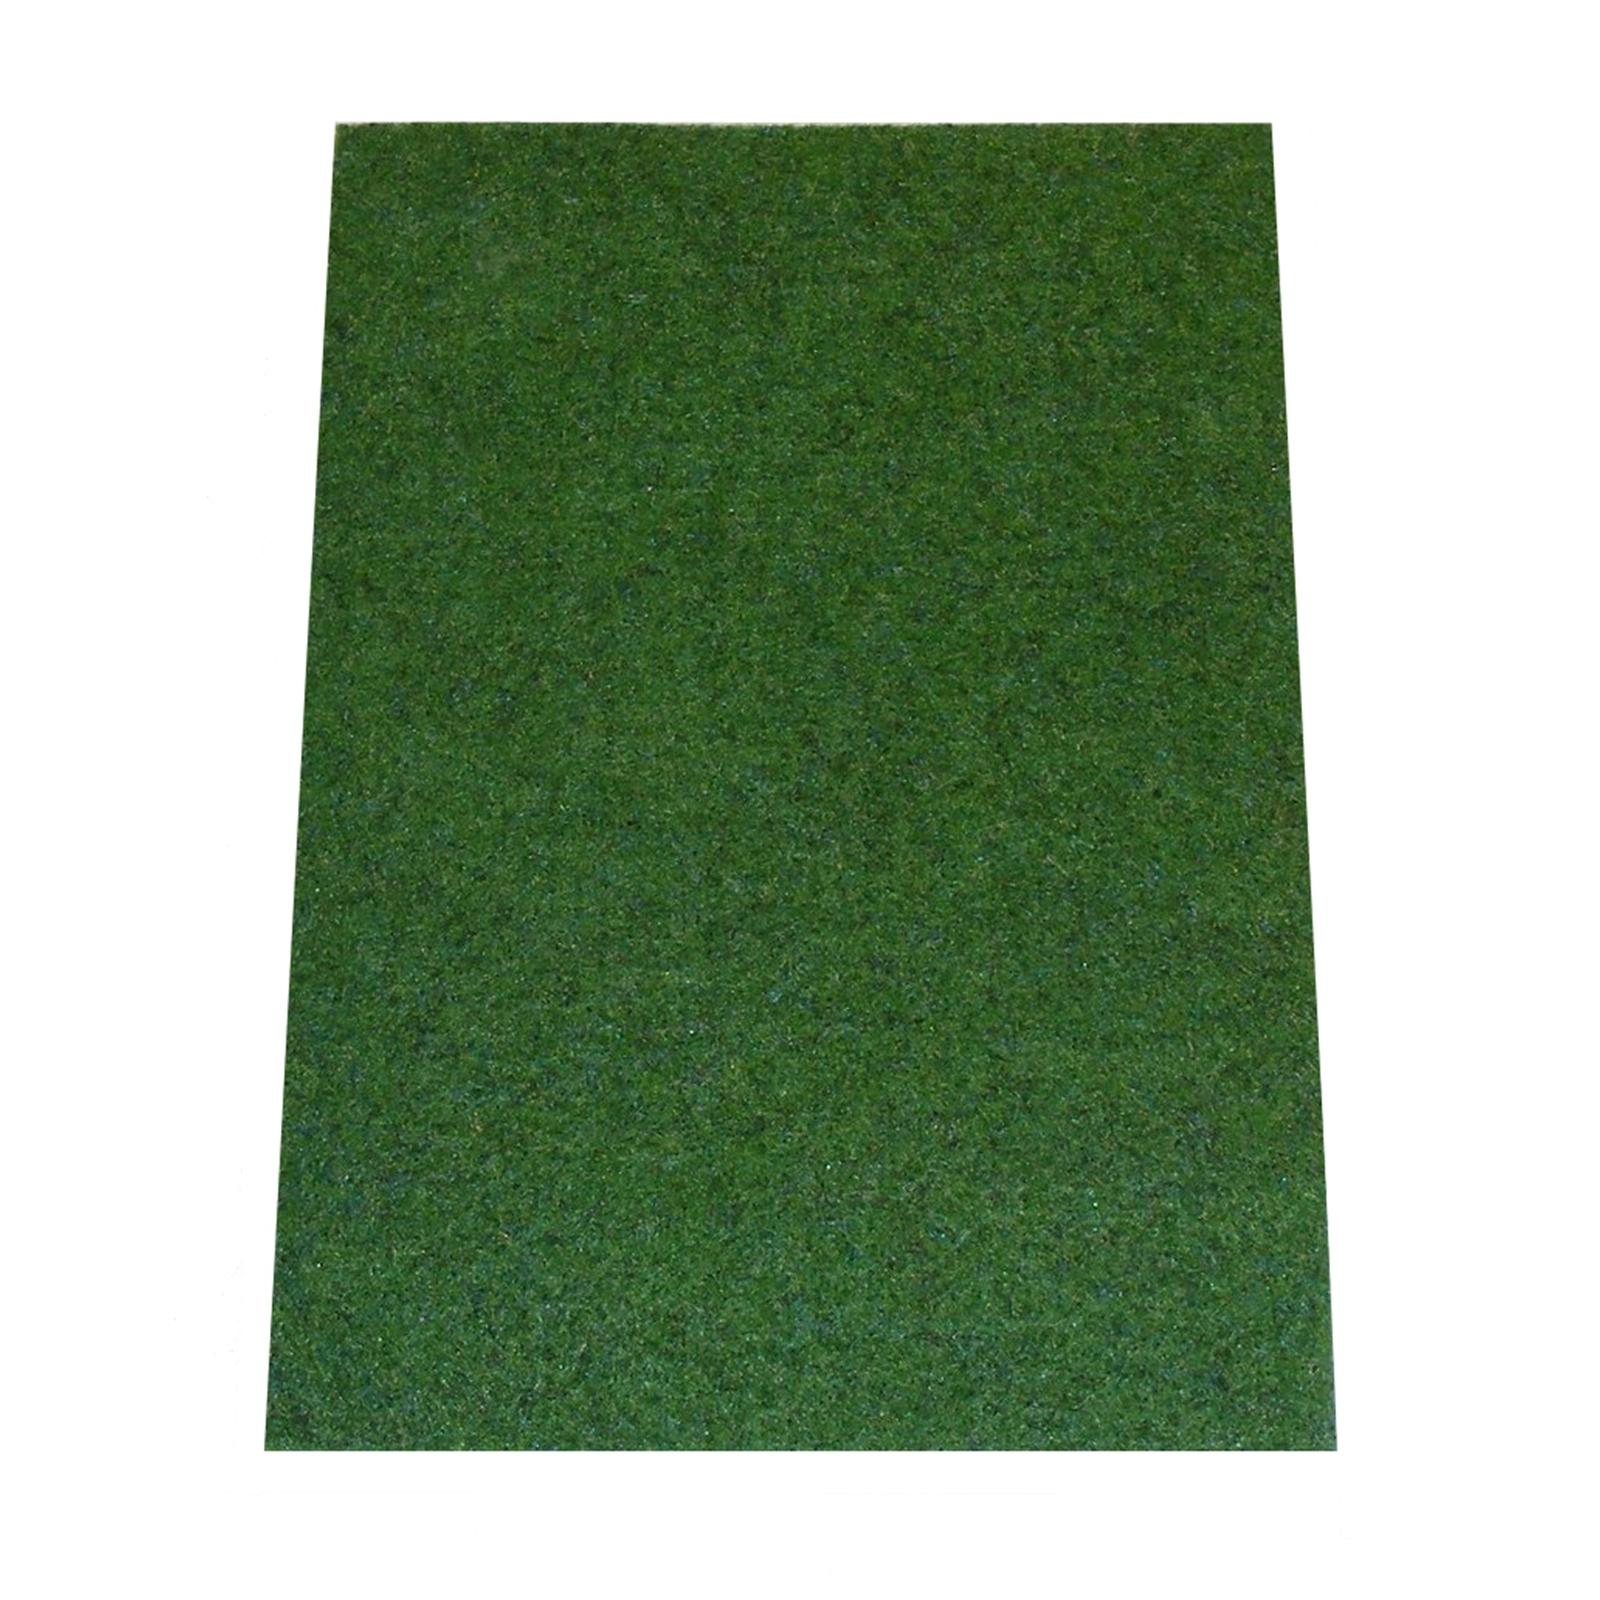 Ideal DIY Eildon Green Flat Marine Carpet